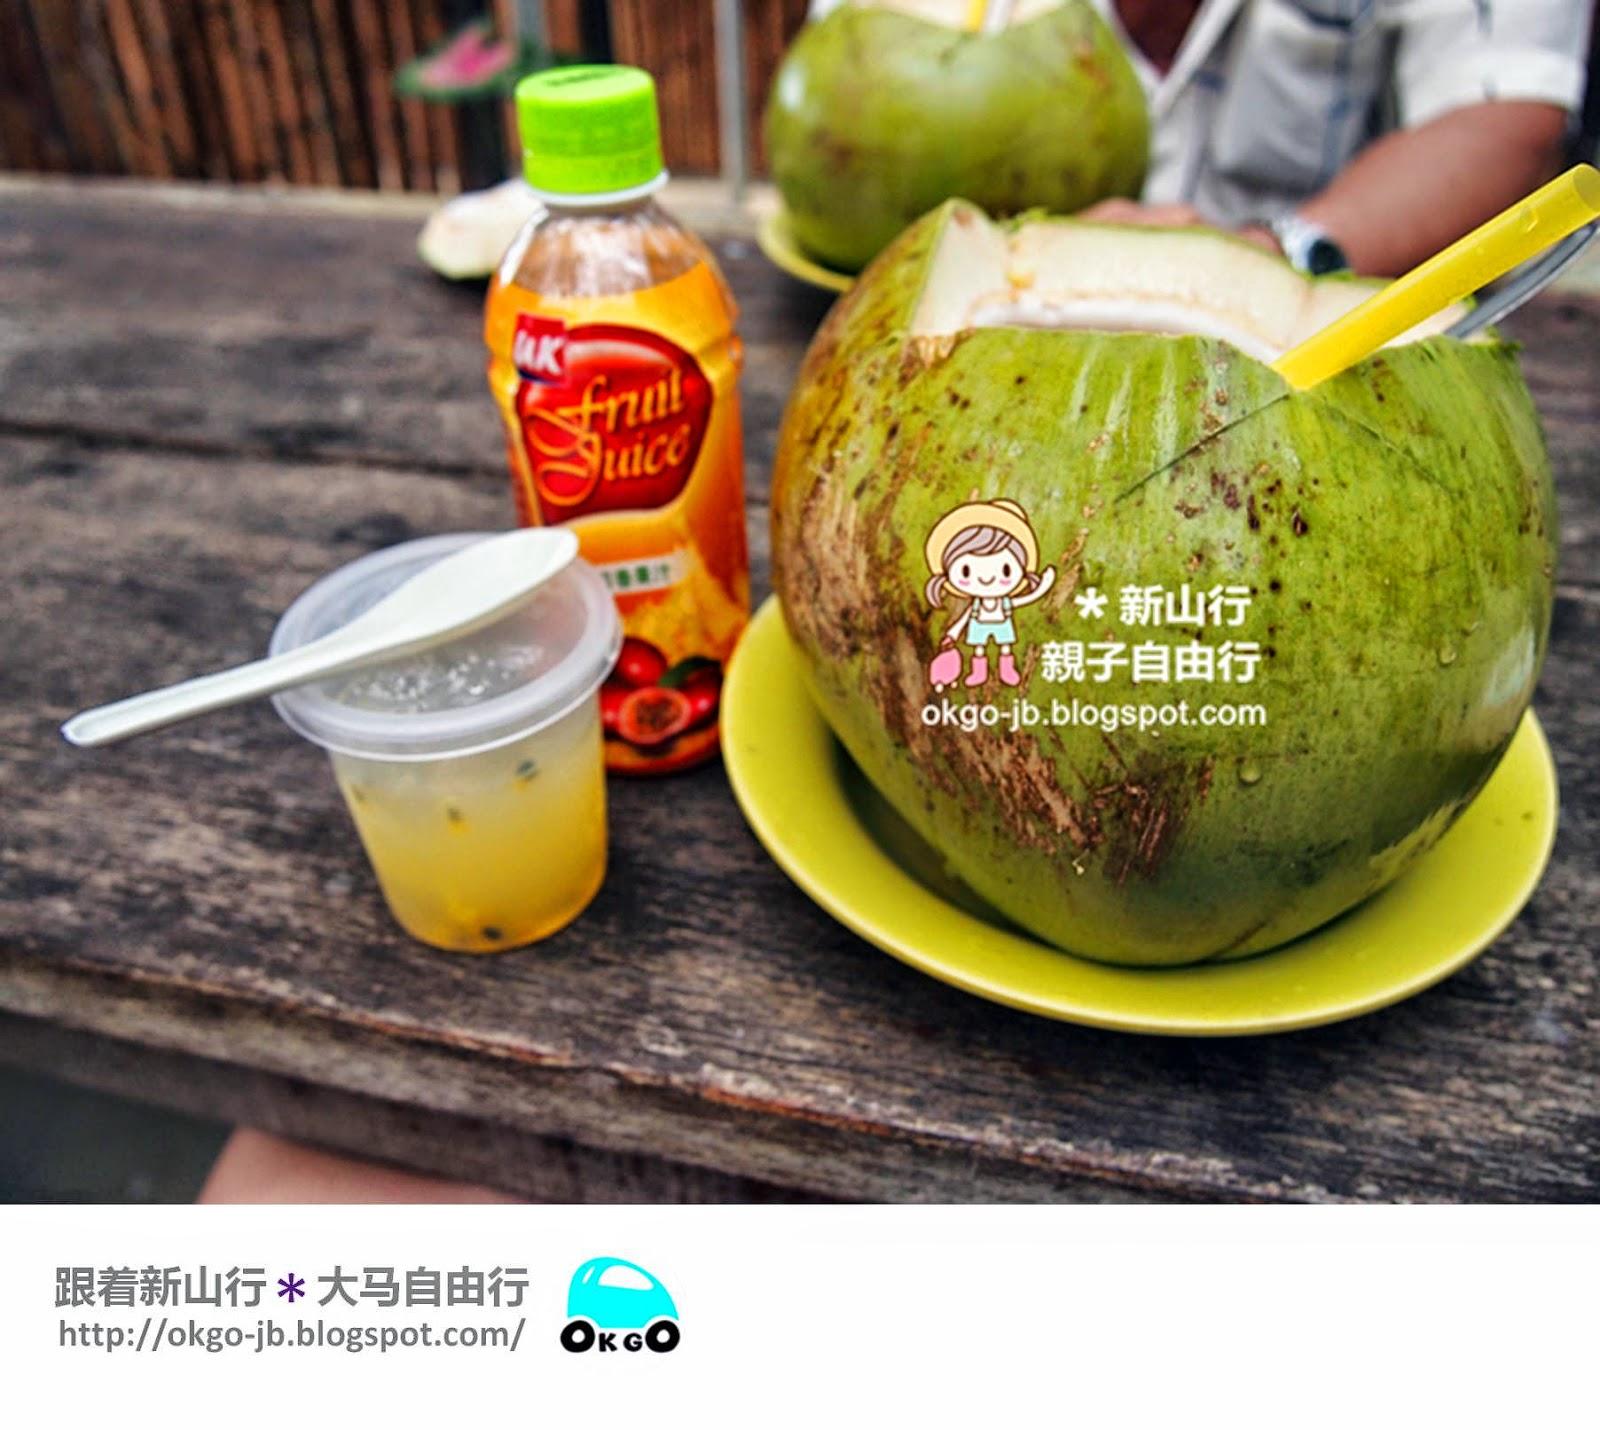 Kluang UK Farm coconut juice